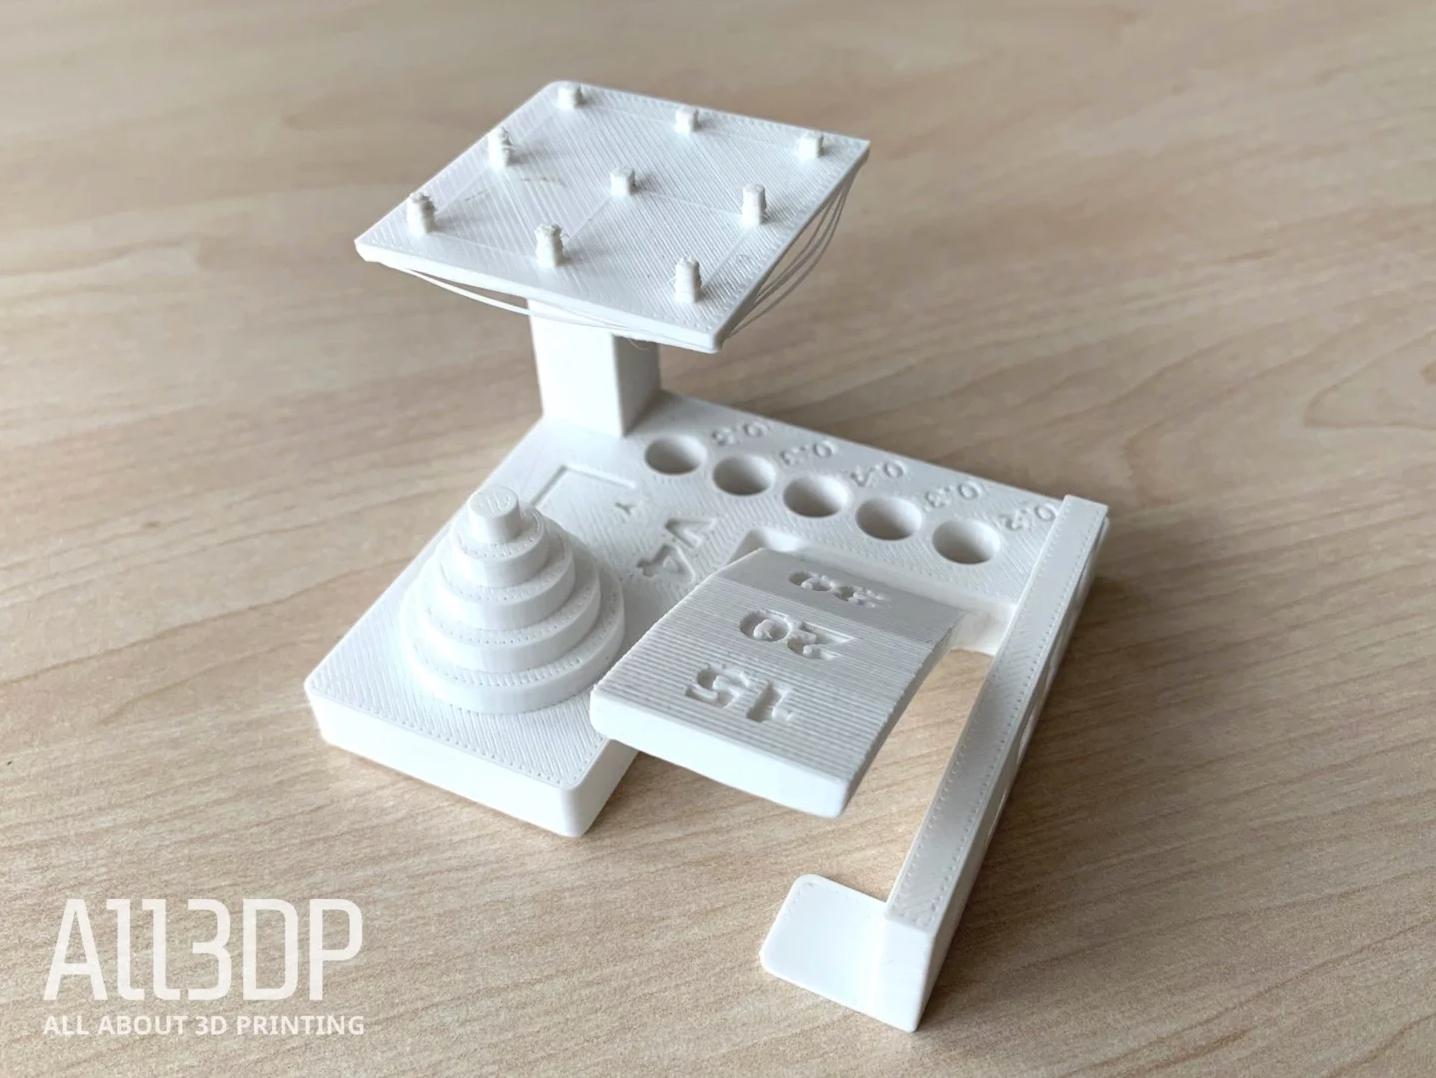 Ender-3-Pro-Autodesk-Kickstarter